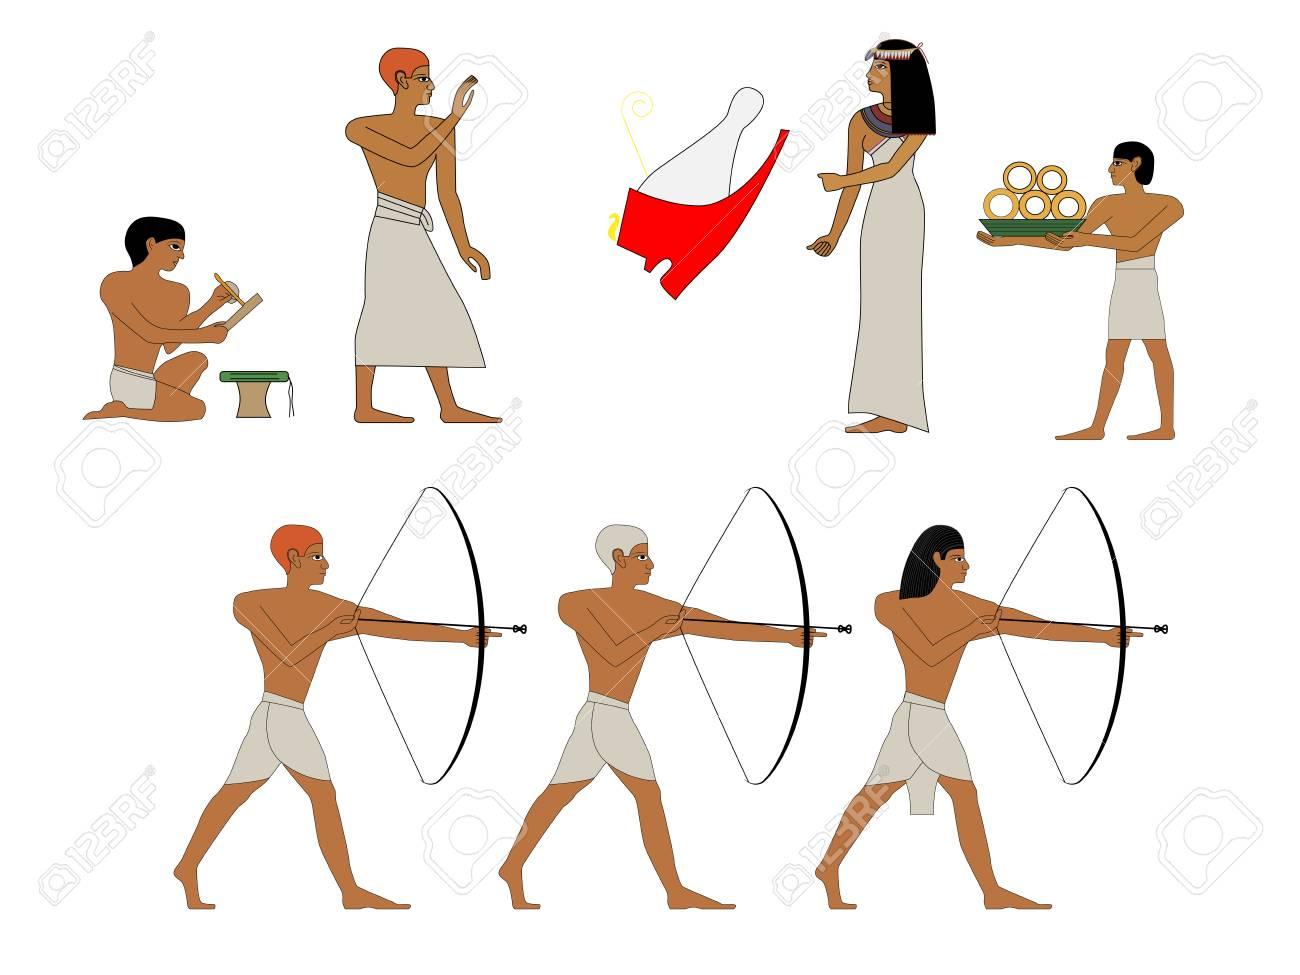 Ancient Egyptian people scene illustration.